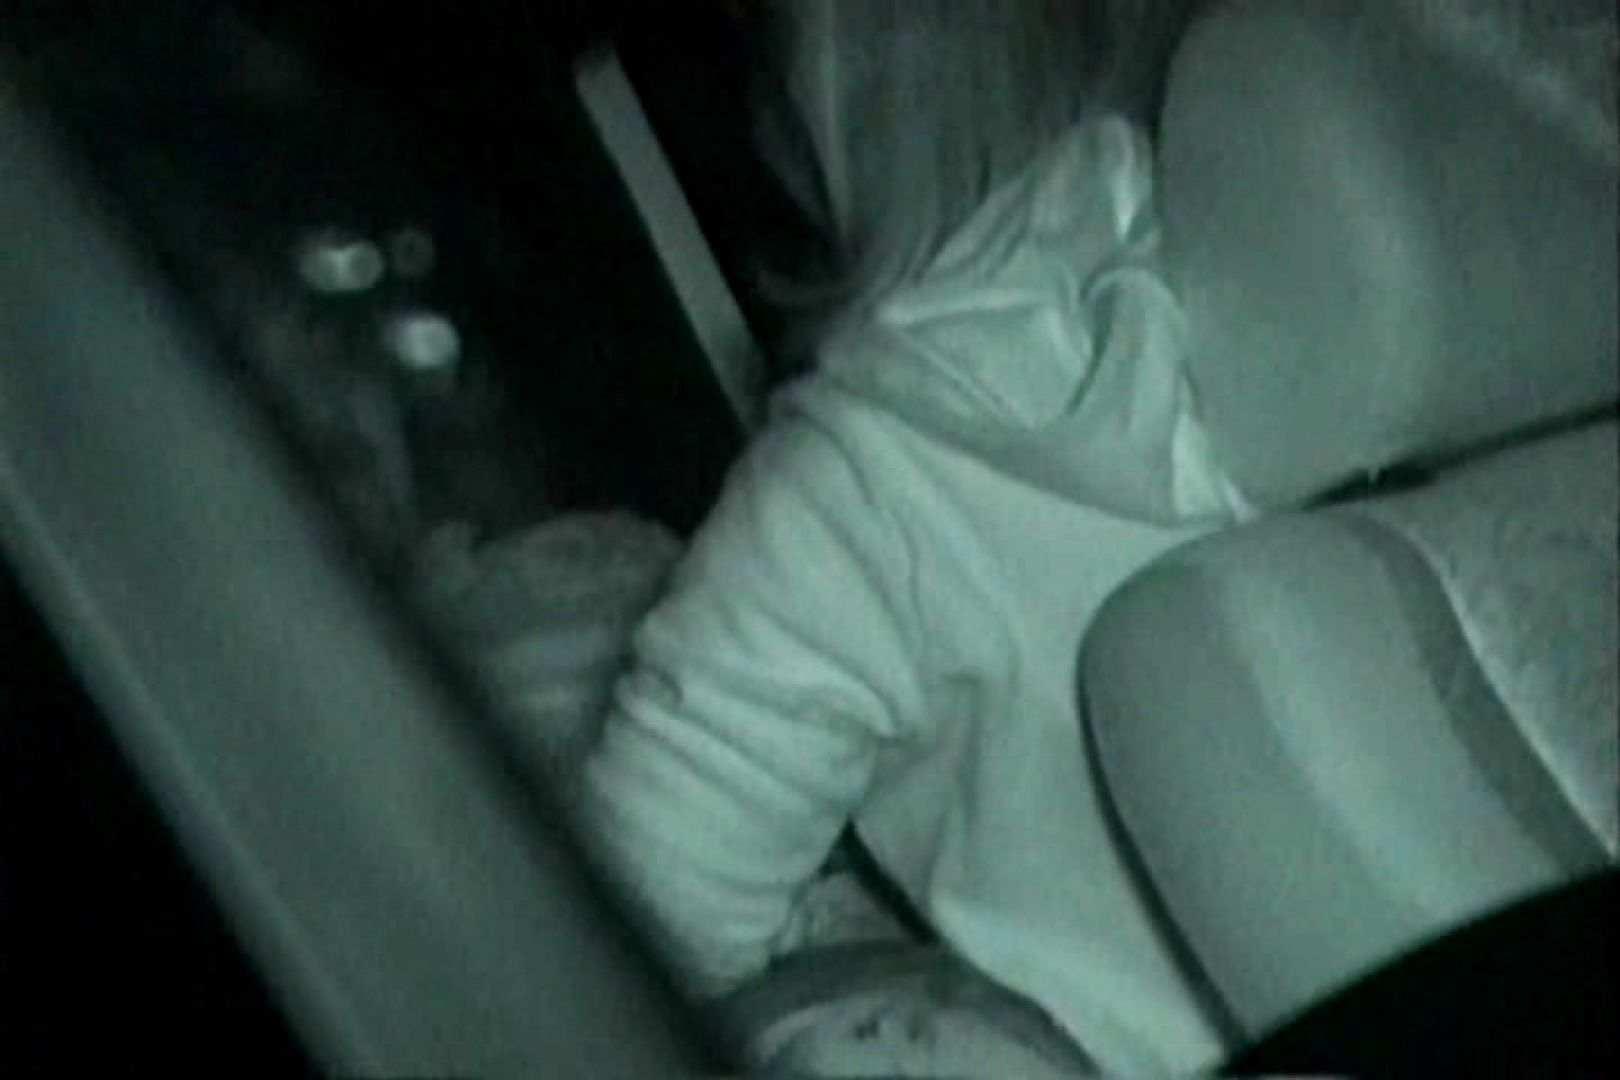 充血監督の深夜の運動会Vol.126 赤外線 エロ無料画像 107画像 88